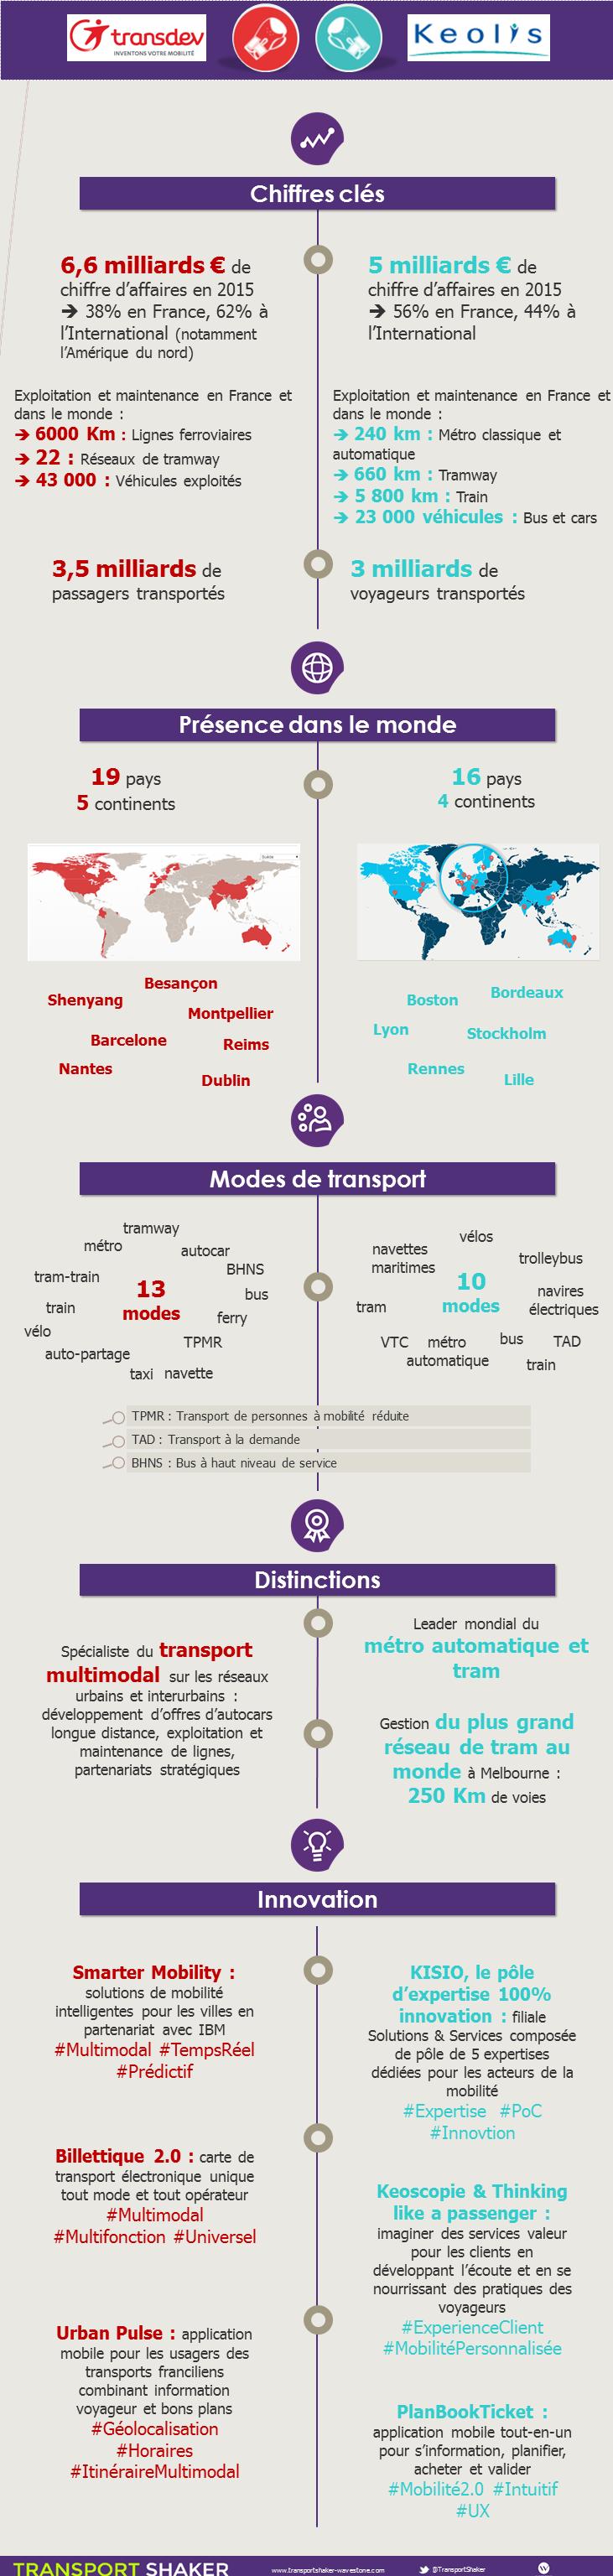 Infographie Kéolis vs Transdev